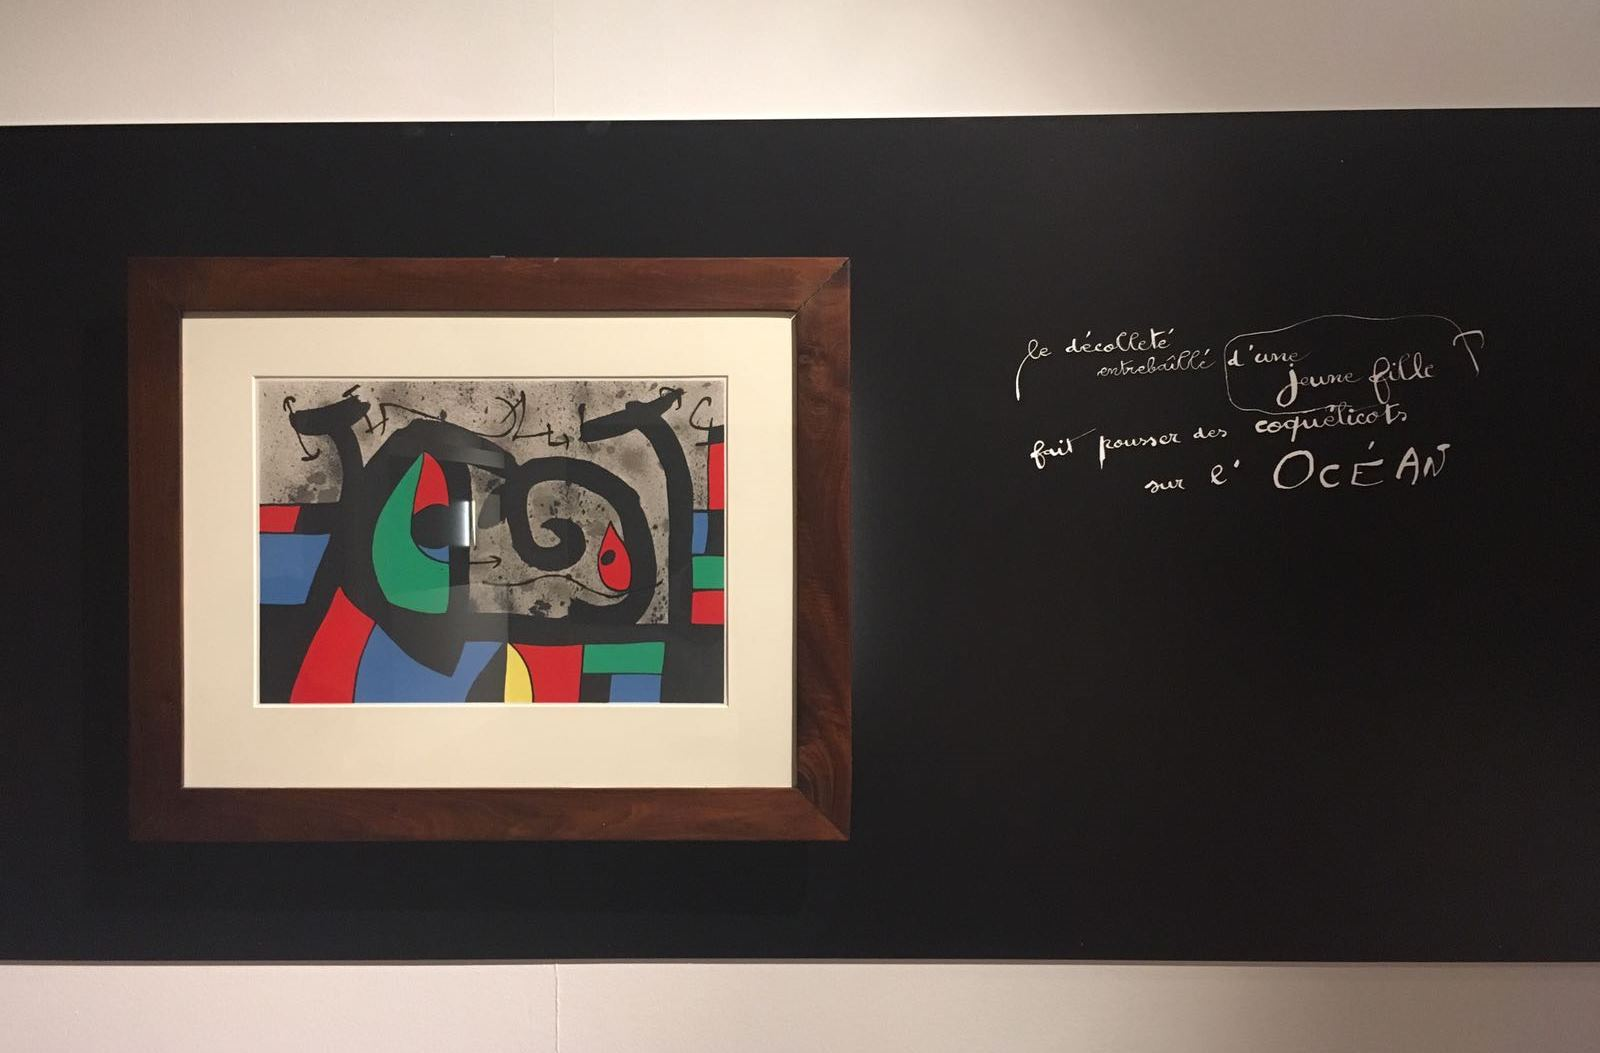 Successo per la mostra di Miró a Recanati. Prorogata fino al 5 novembre